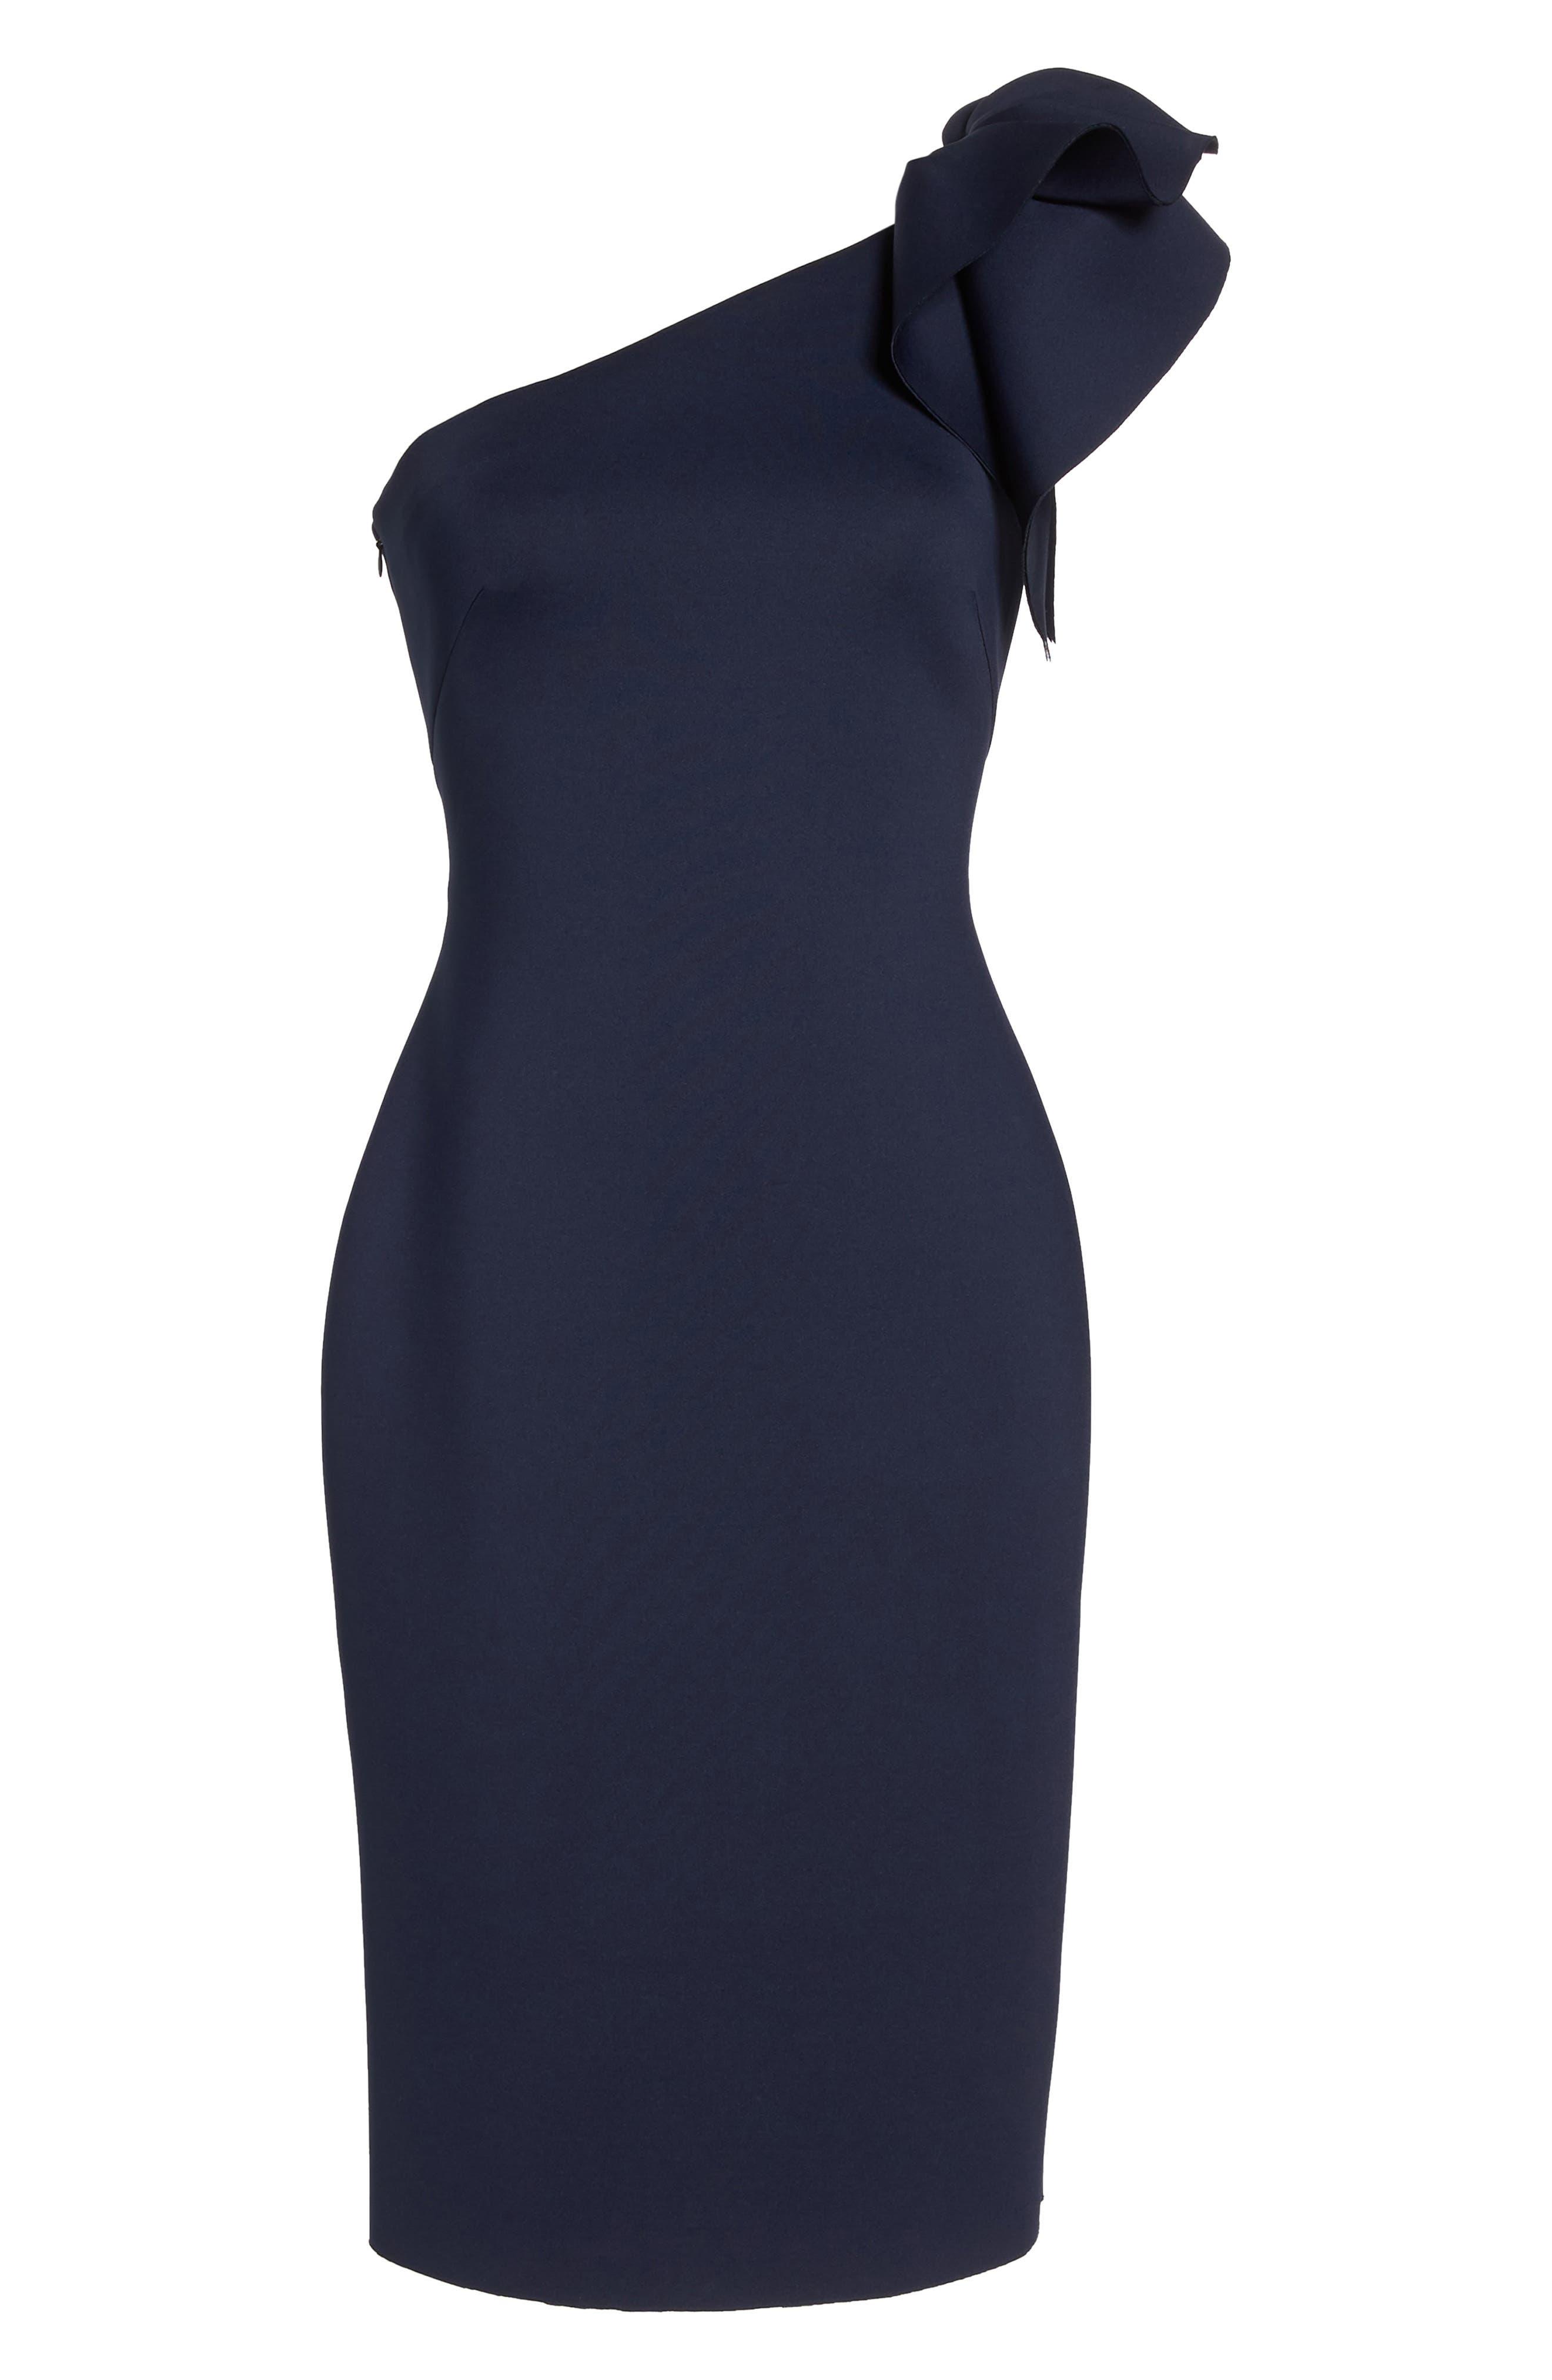 One-Shoulder Ruffle Sheath Dress,                             Alternate thumbnail 7, color,                             NAVY